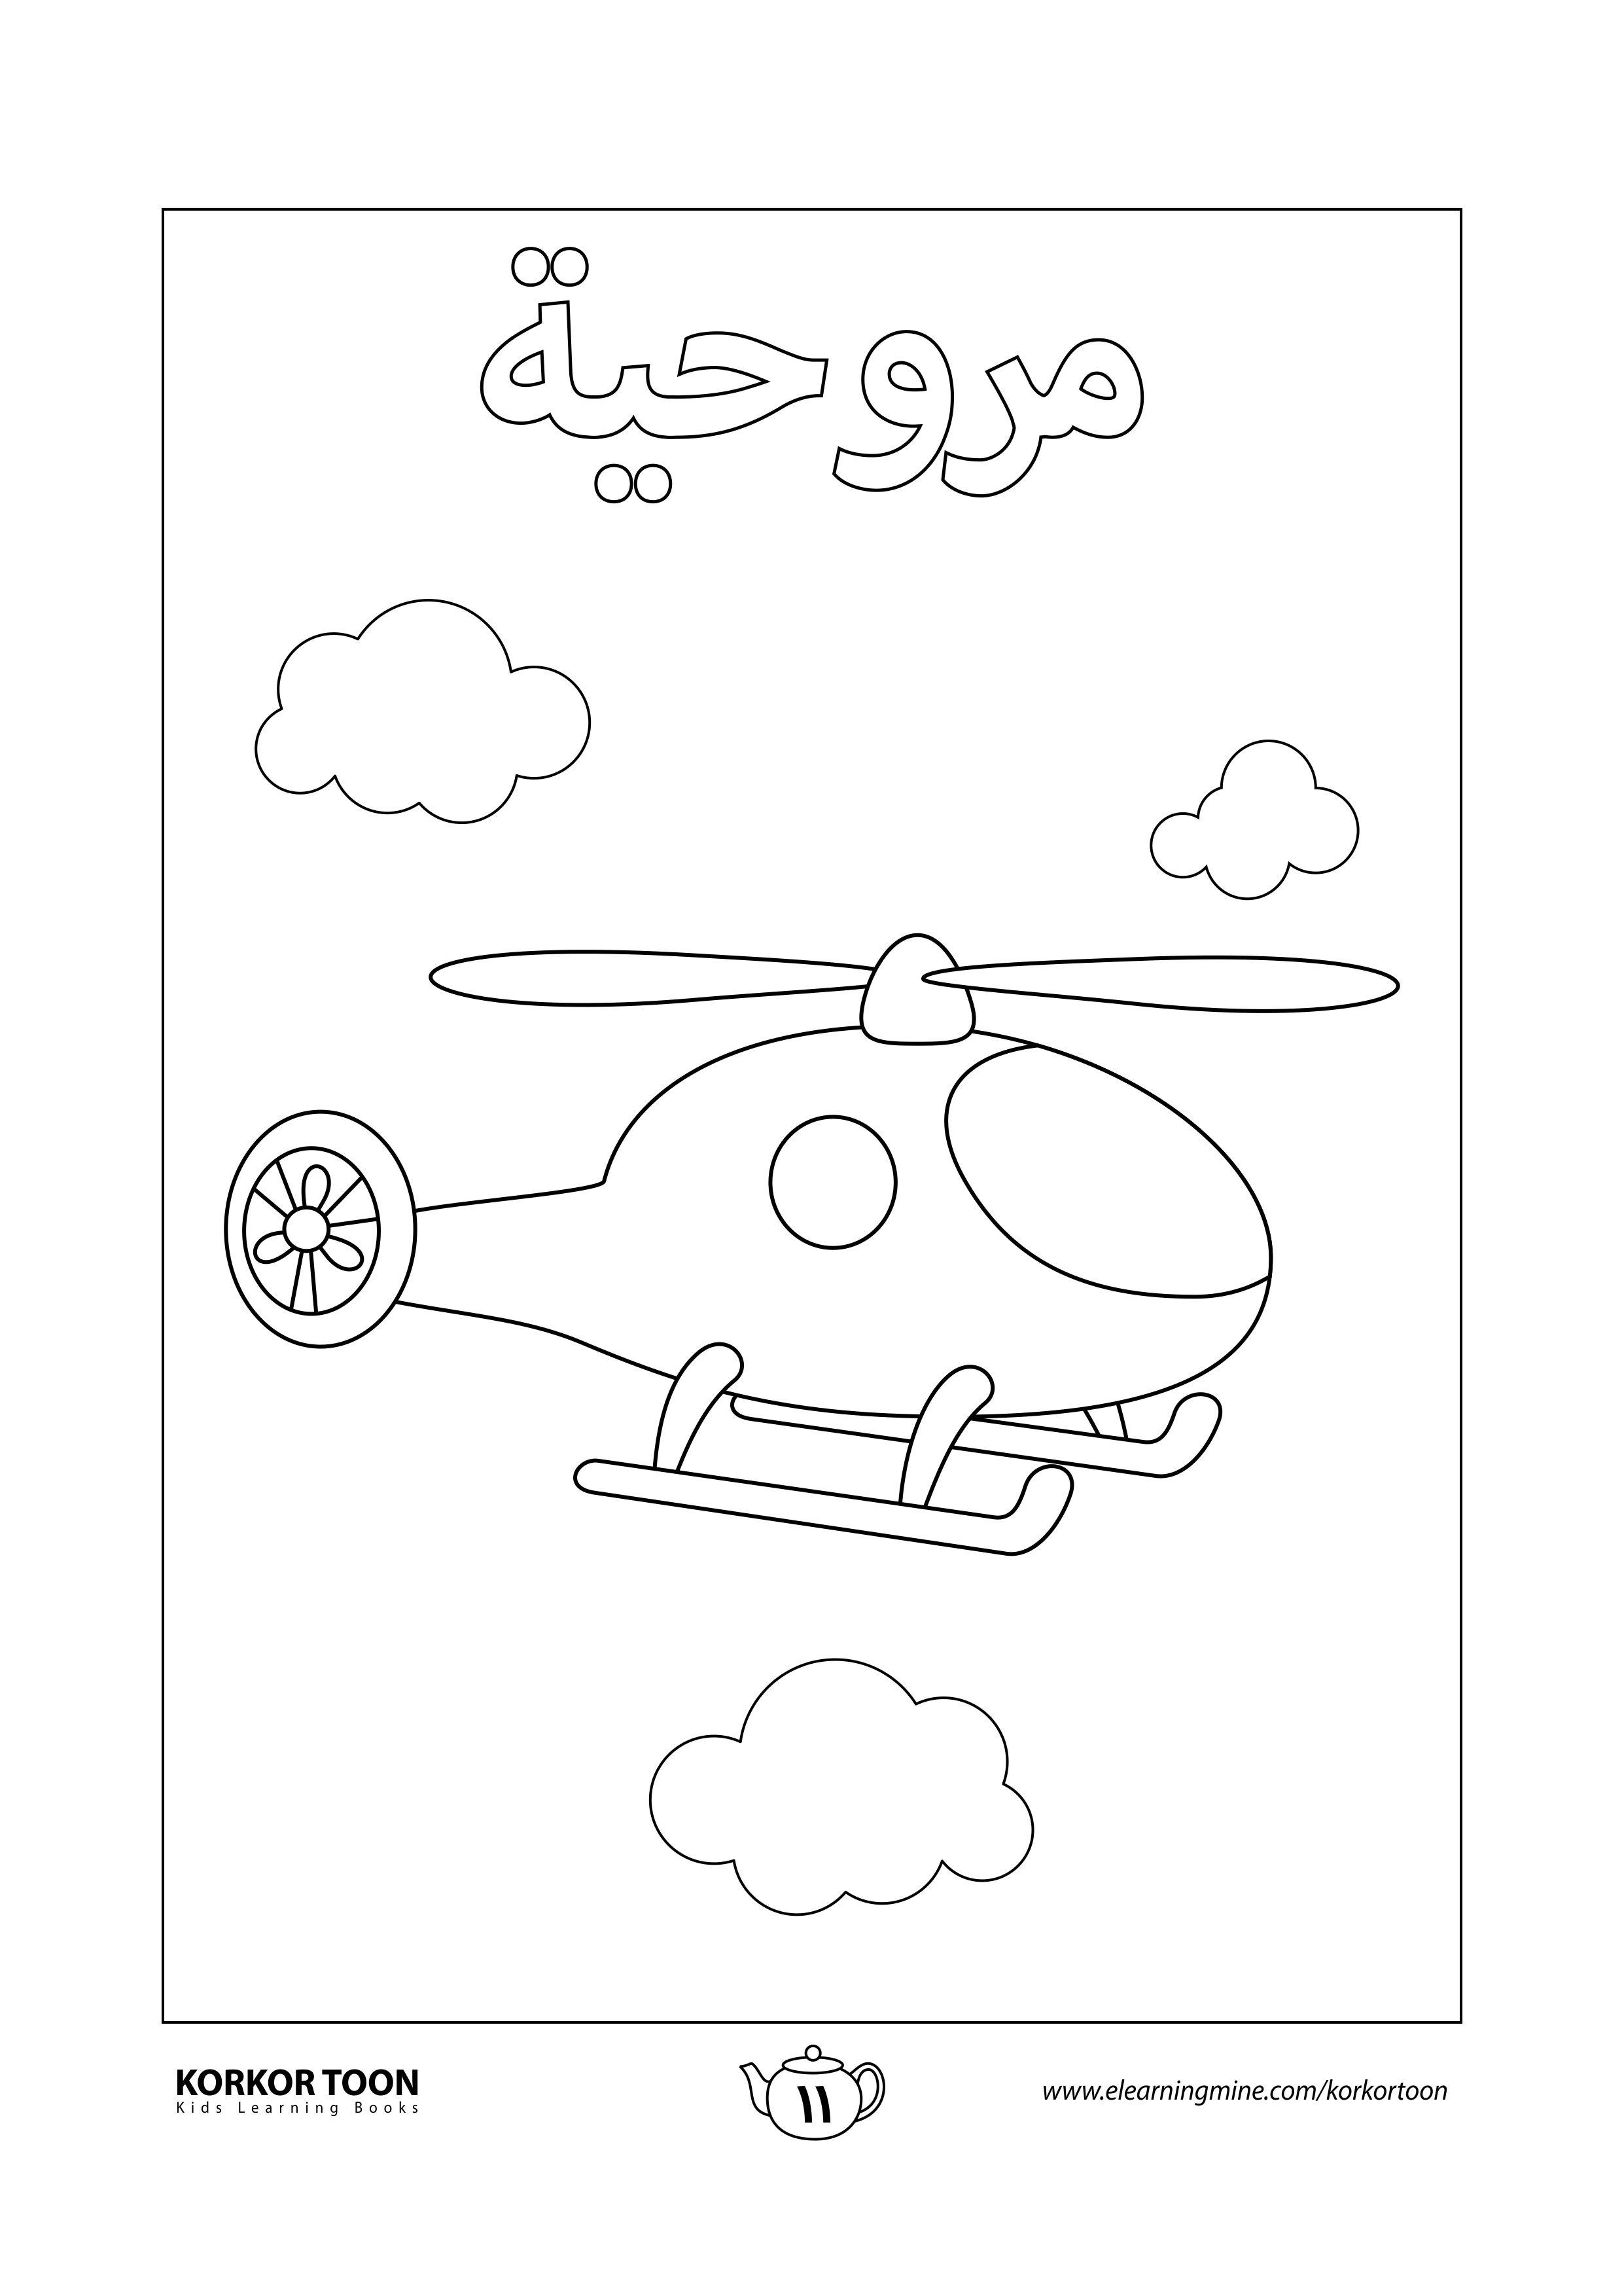 كتاب تلوين وسائل المواصلات تلوين المروحية صفحة 11 Coloring Books Coloring For Kids Books